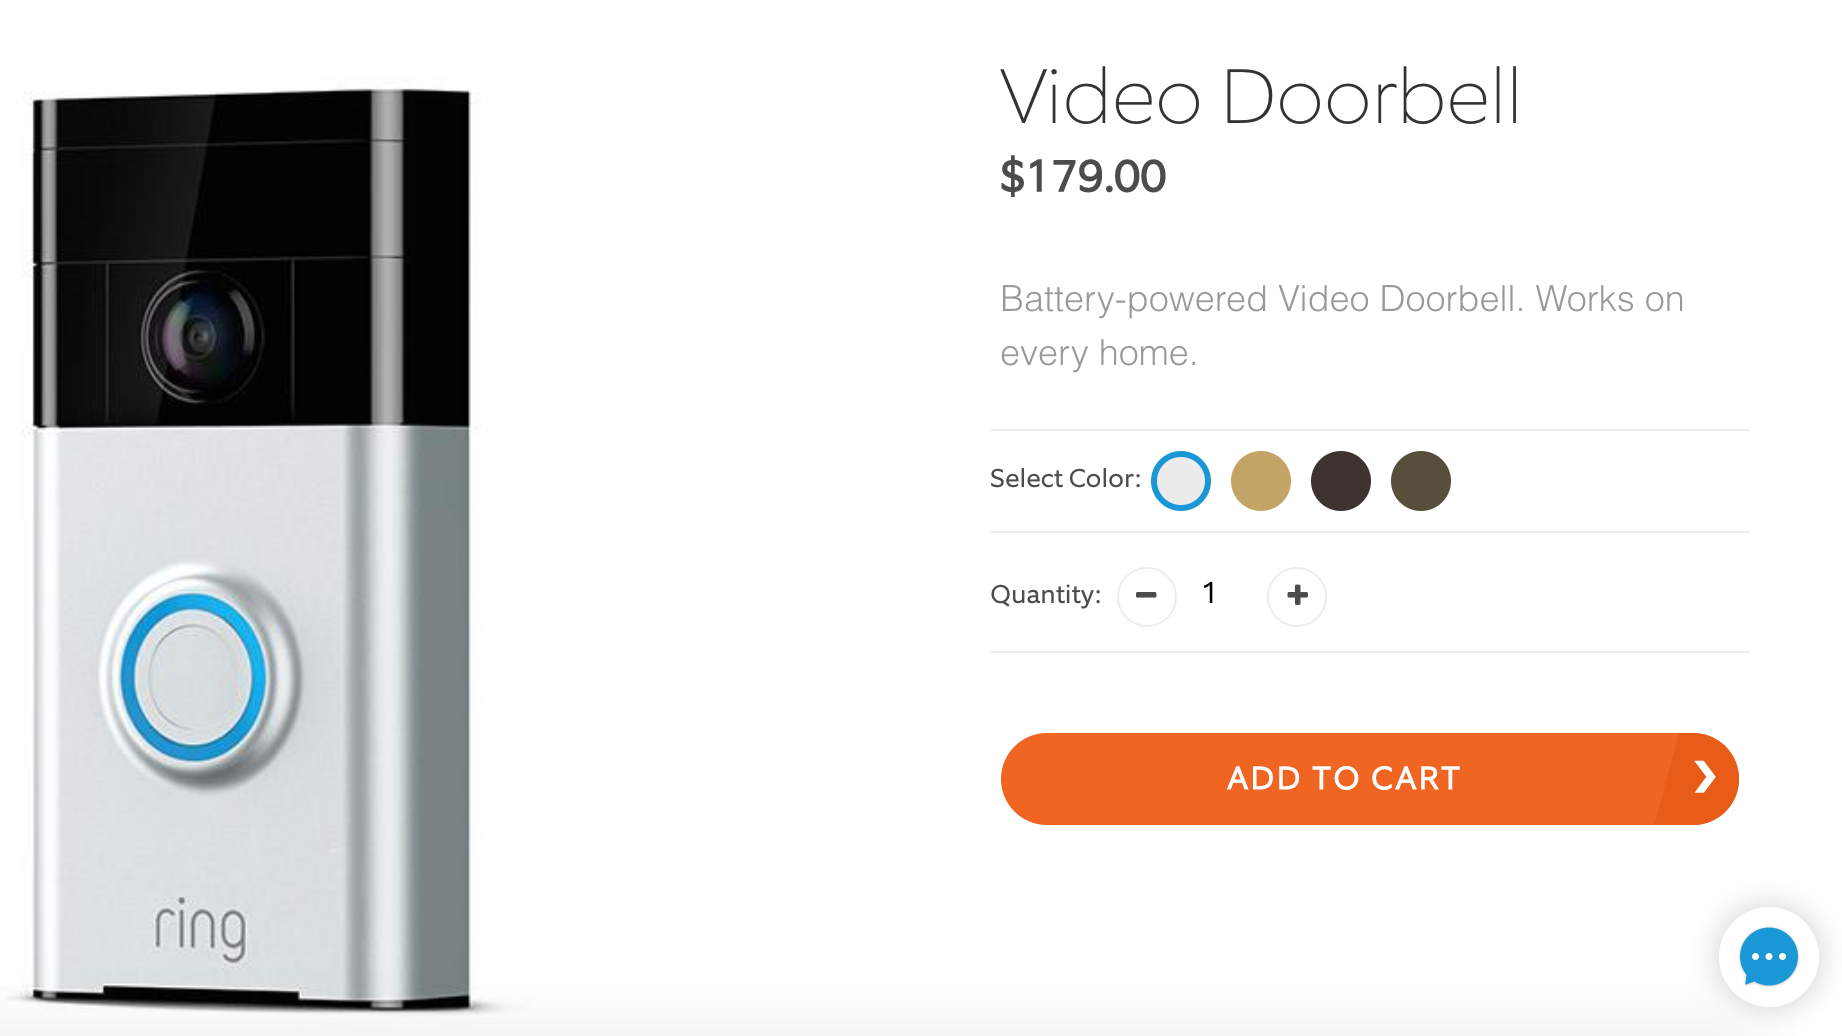 sc 1 st  Gizmodo & Amazon to Blow Over $1 Billion on Doorbells: Report